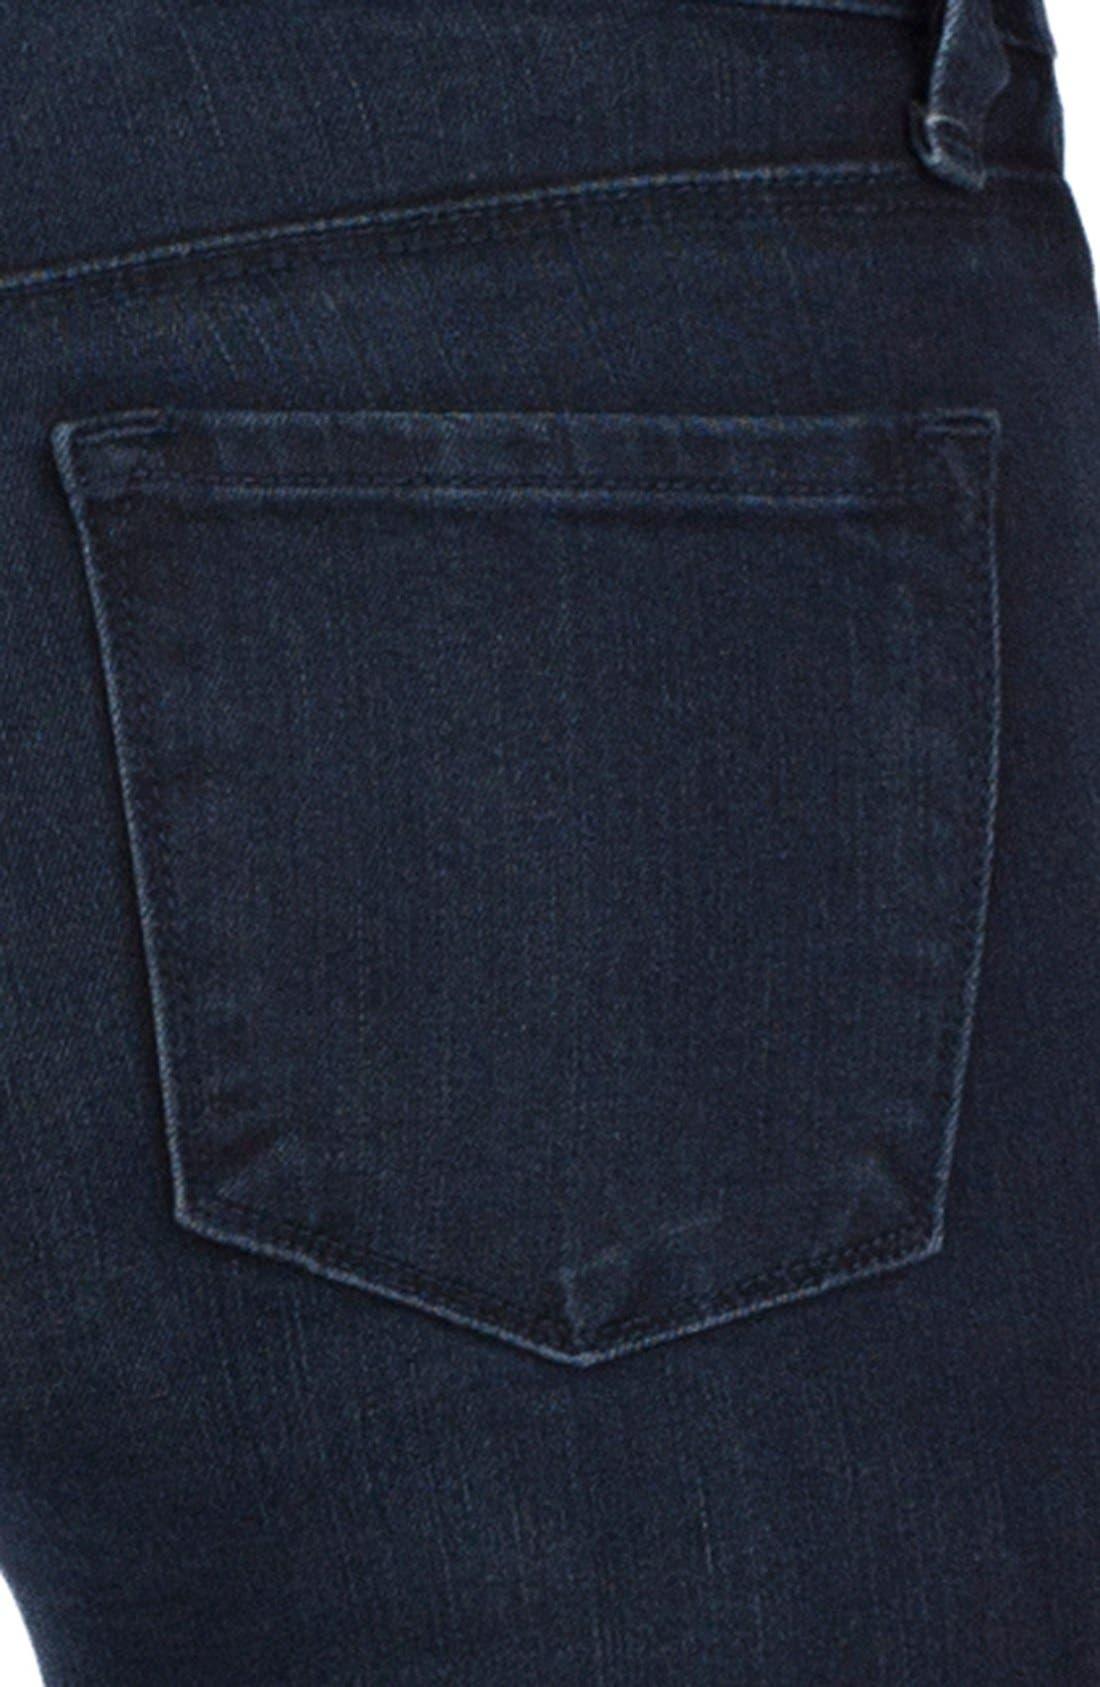 Alternate Image 3  - J Brand 'Willow' Moto Skinny Jeans (Verve)